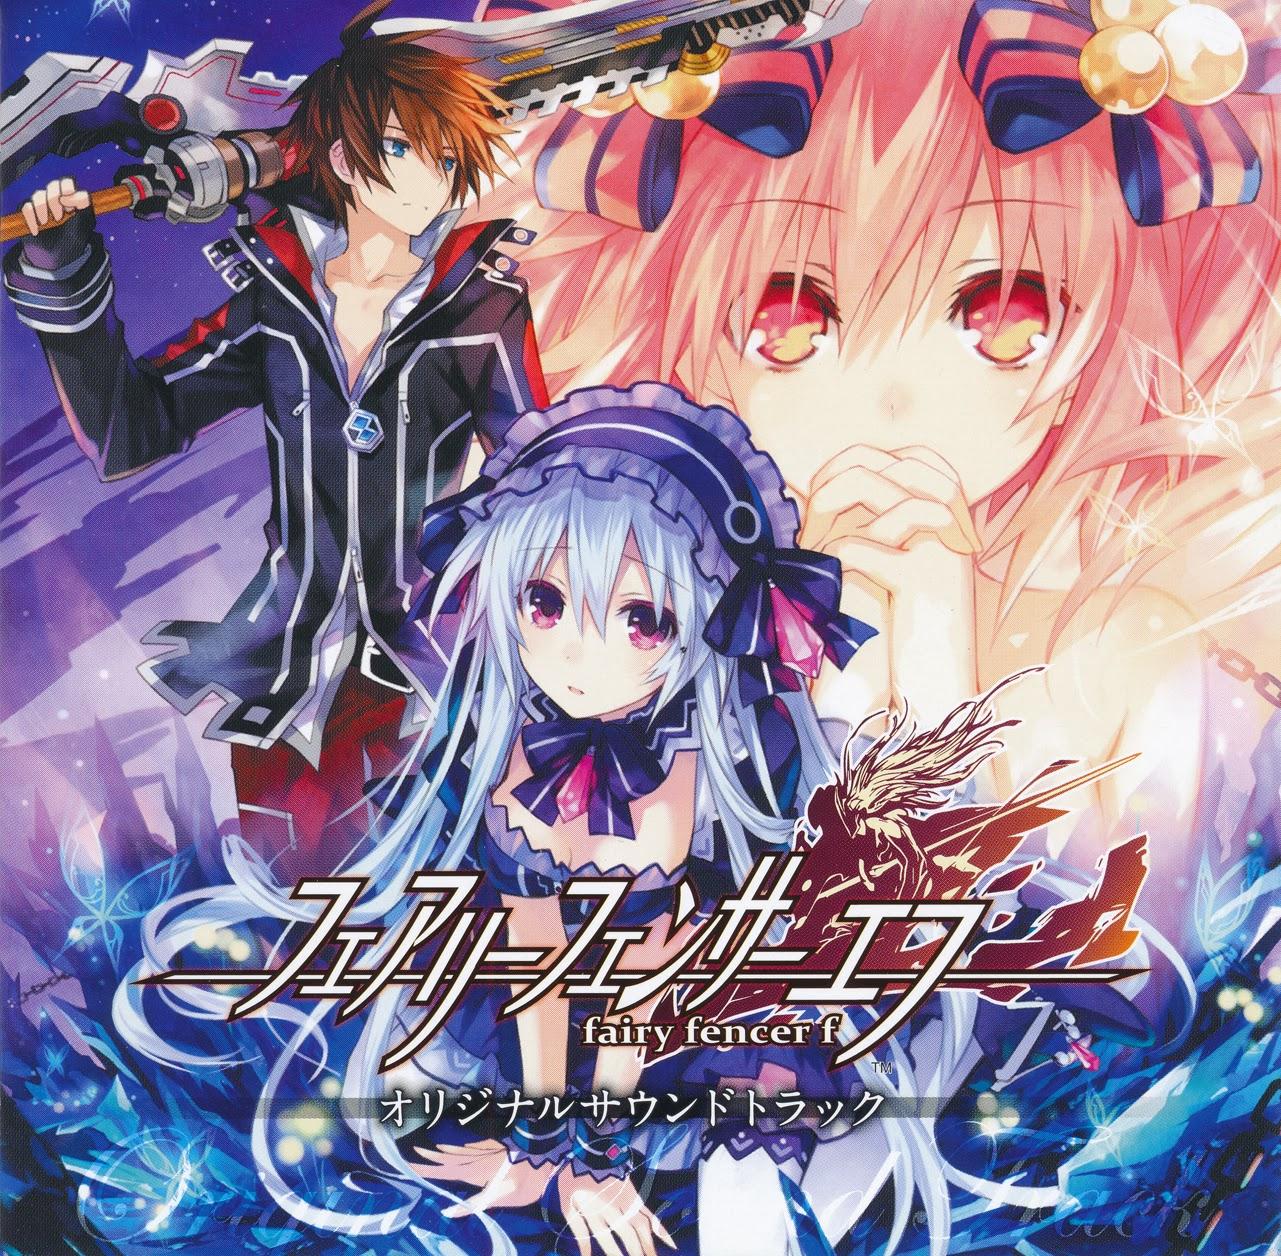 [PC] Fairy Fencer F [RPG | 2015]